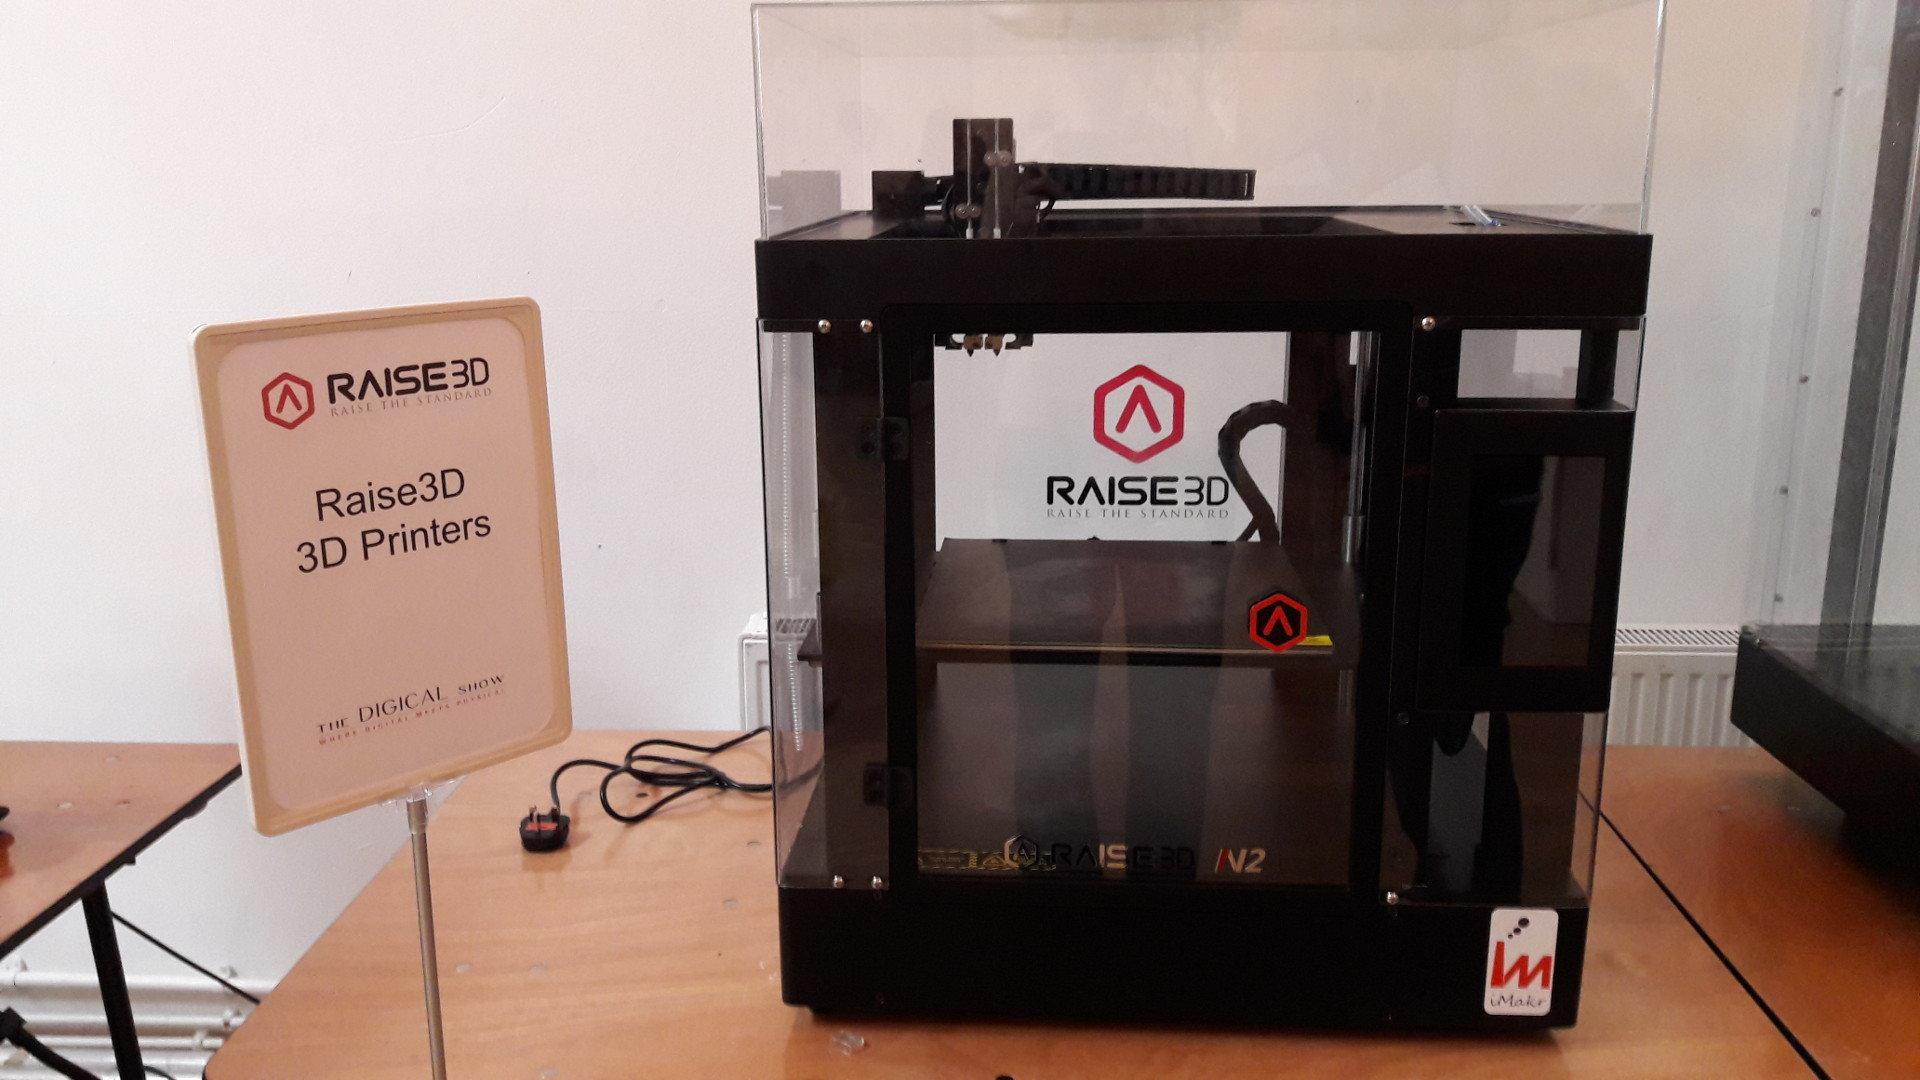 D Printer Exhibition Usa : Raise d printer dwithus